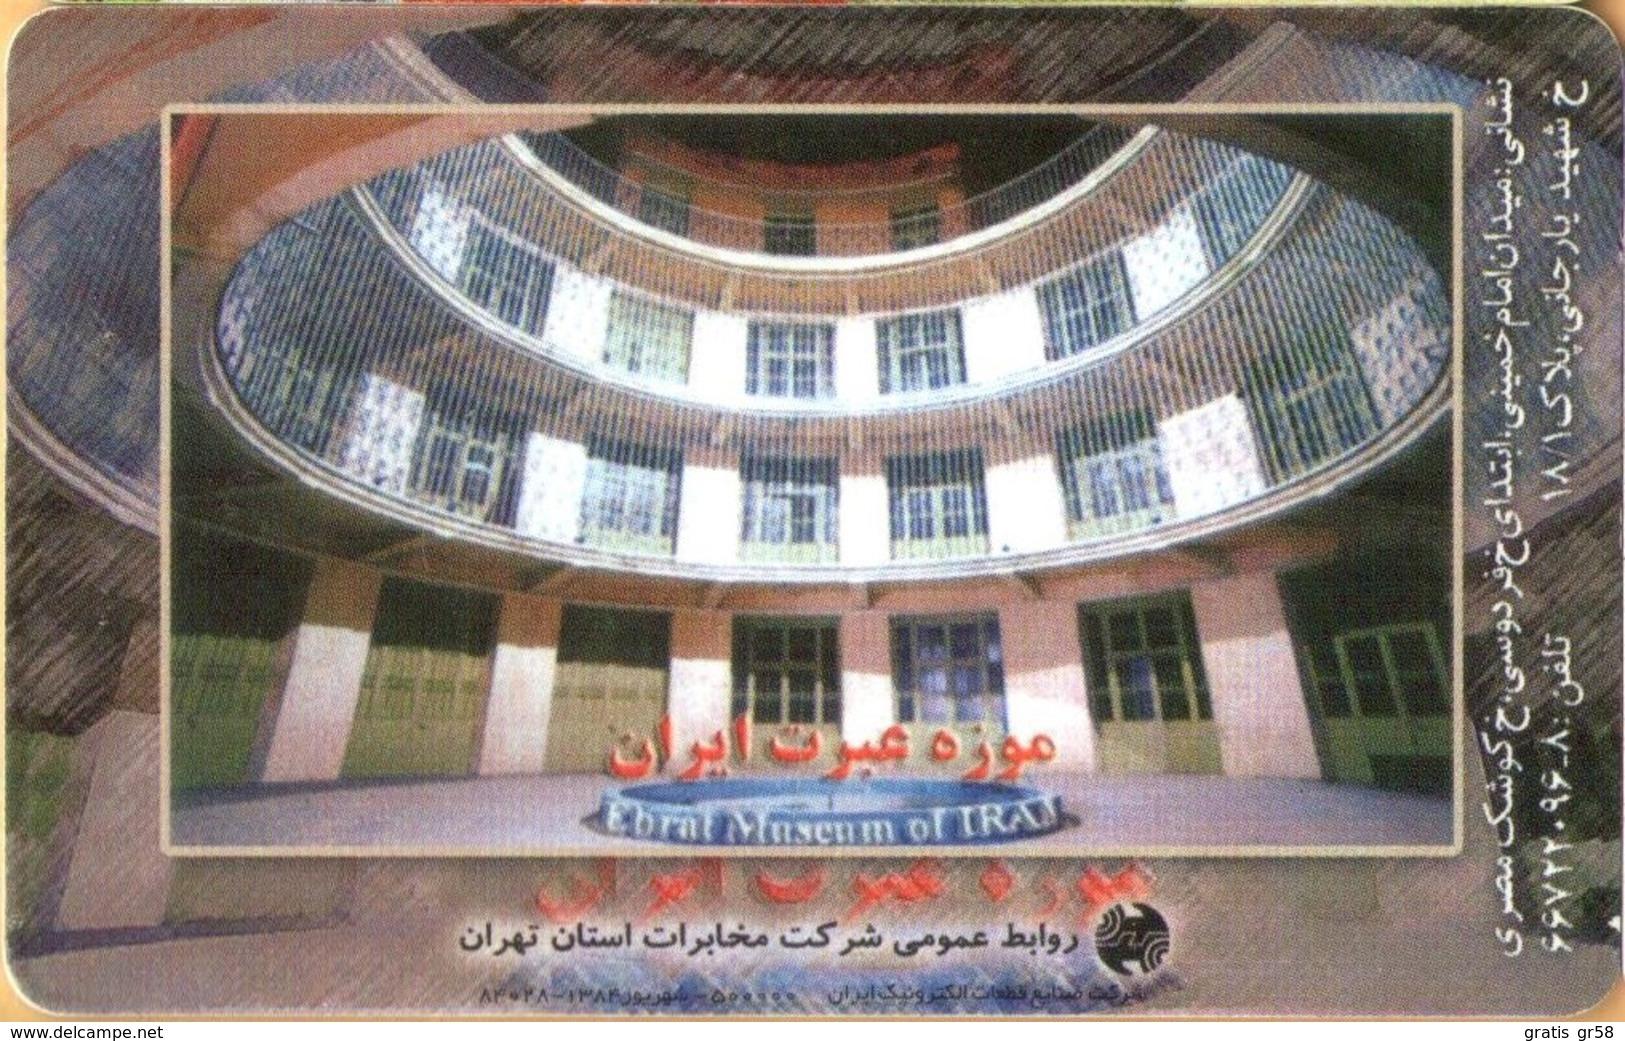 Iran - Iran Telecom - Tahran,IN-Telecom-chip 092, Ebrat Museum Of Iran, Used As Scan - Iran